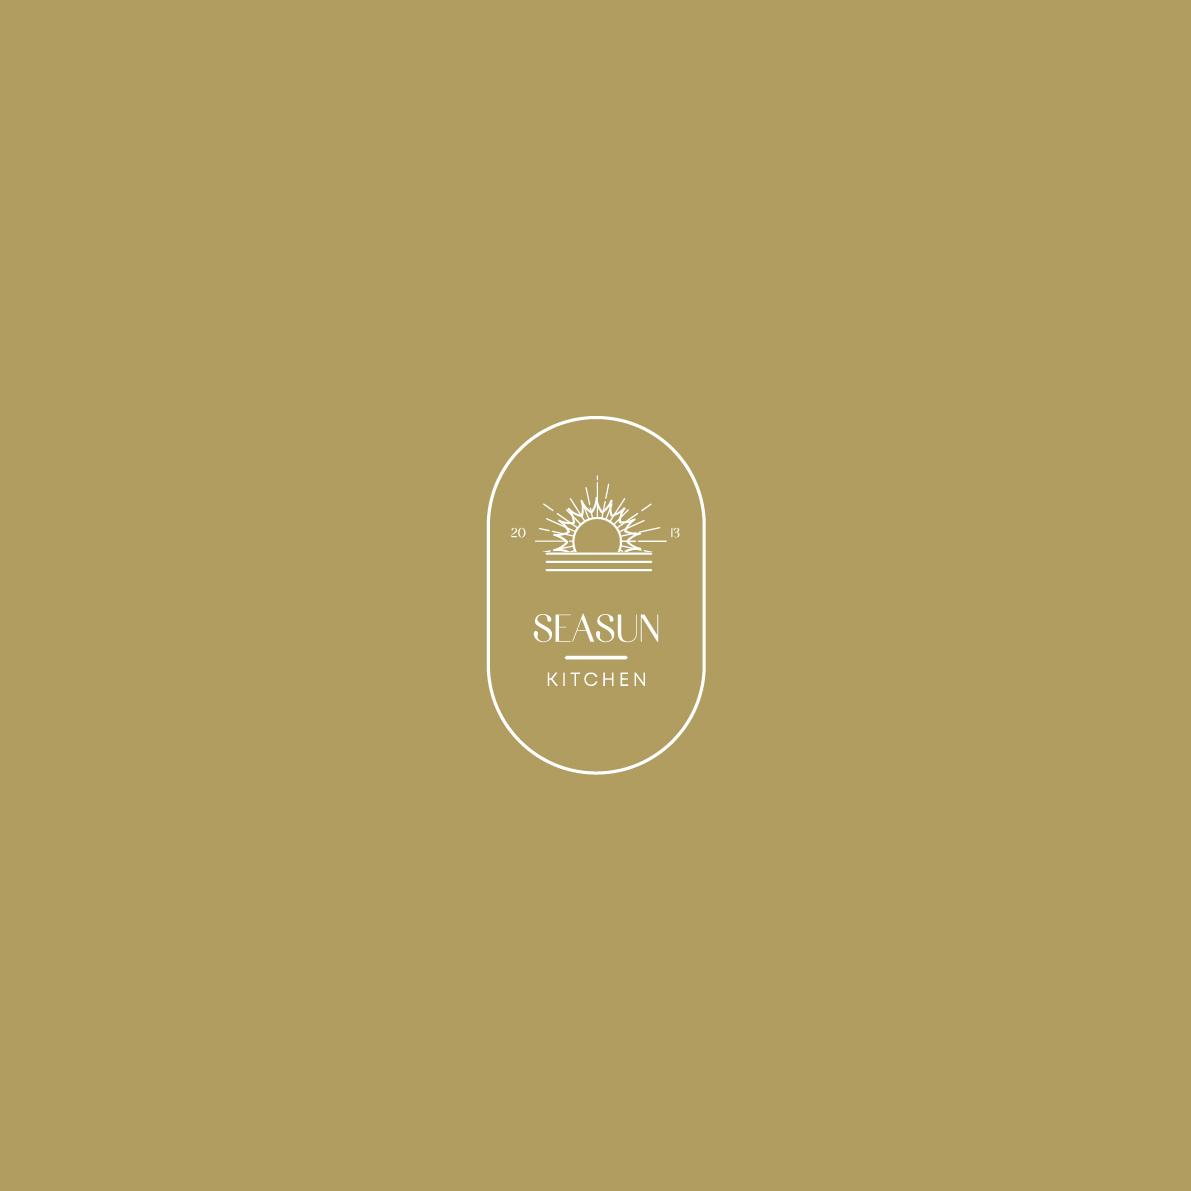 SeaSun-Kitchen-gold.jpg